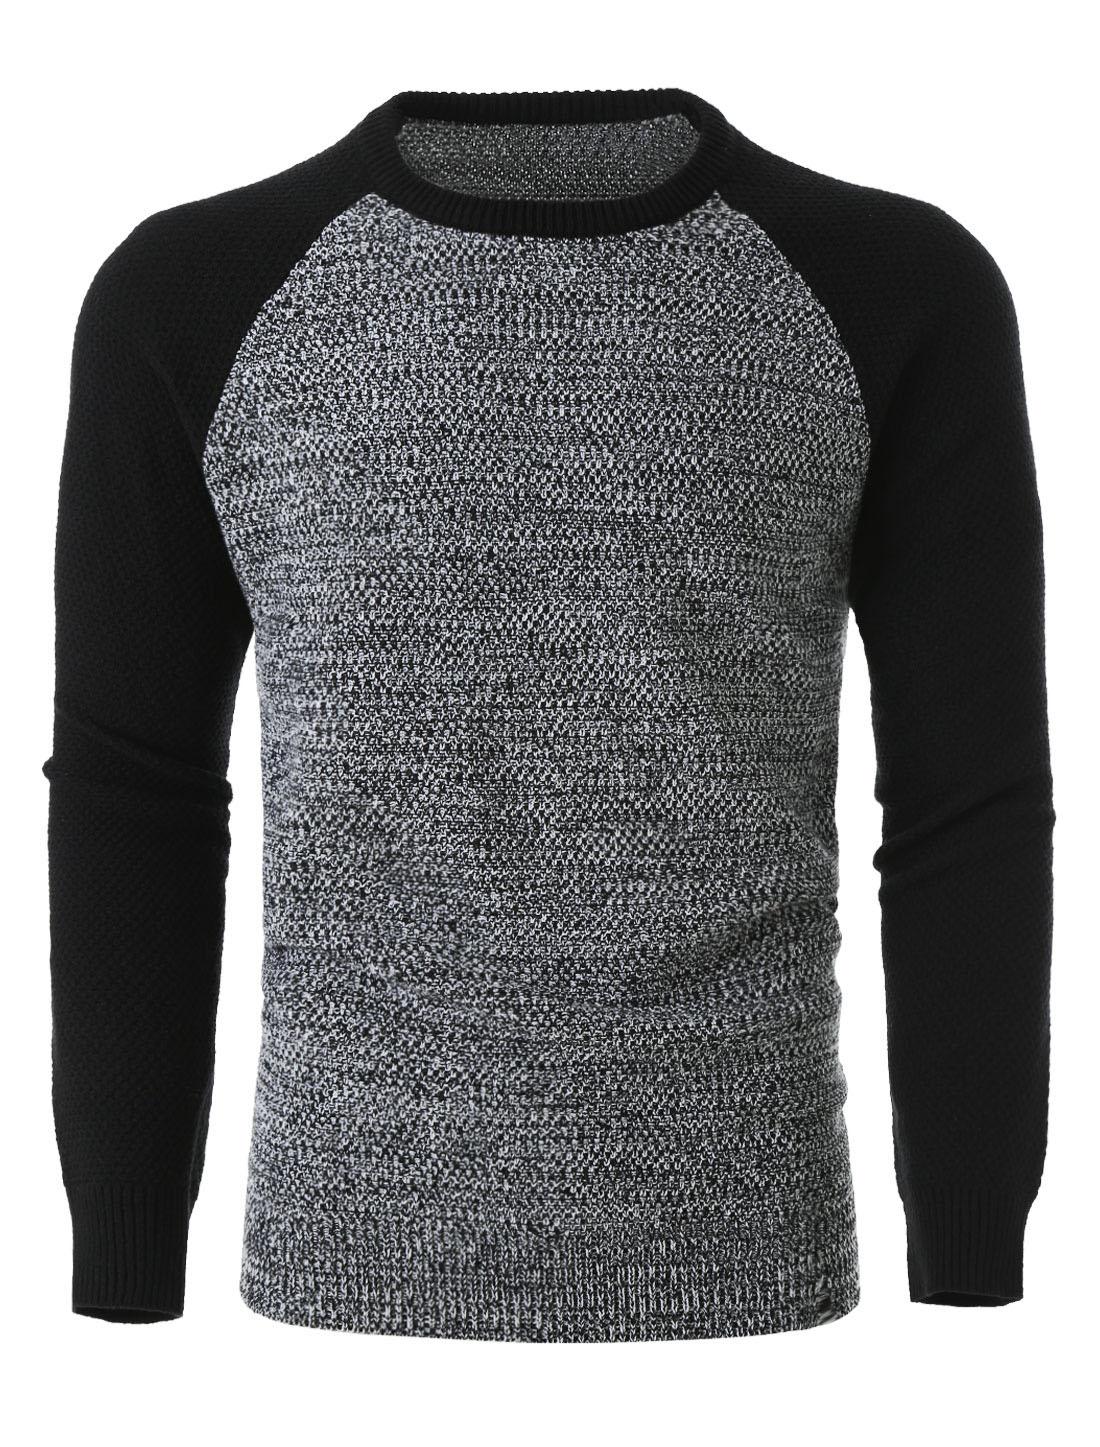 Men Colorblock Lightweight Long Sleeve Crewneck Pullover Knit Sweater Grey M